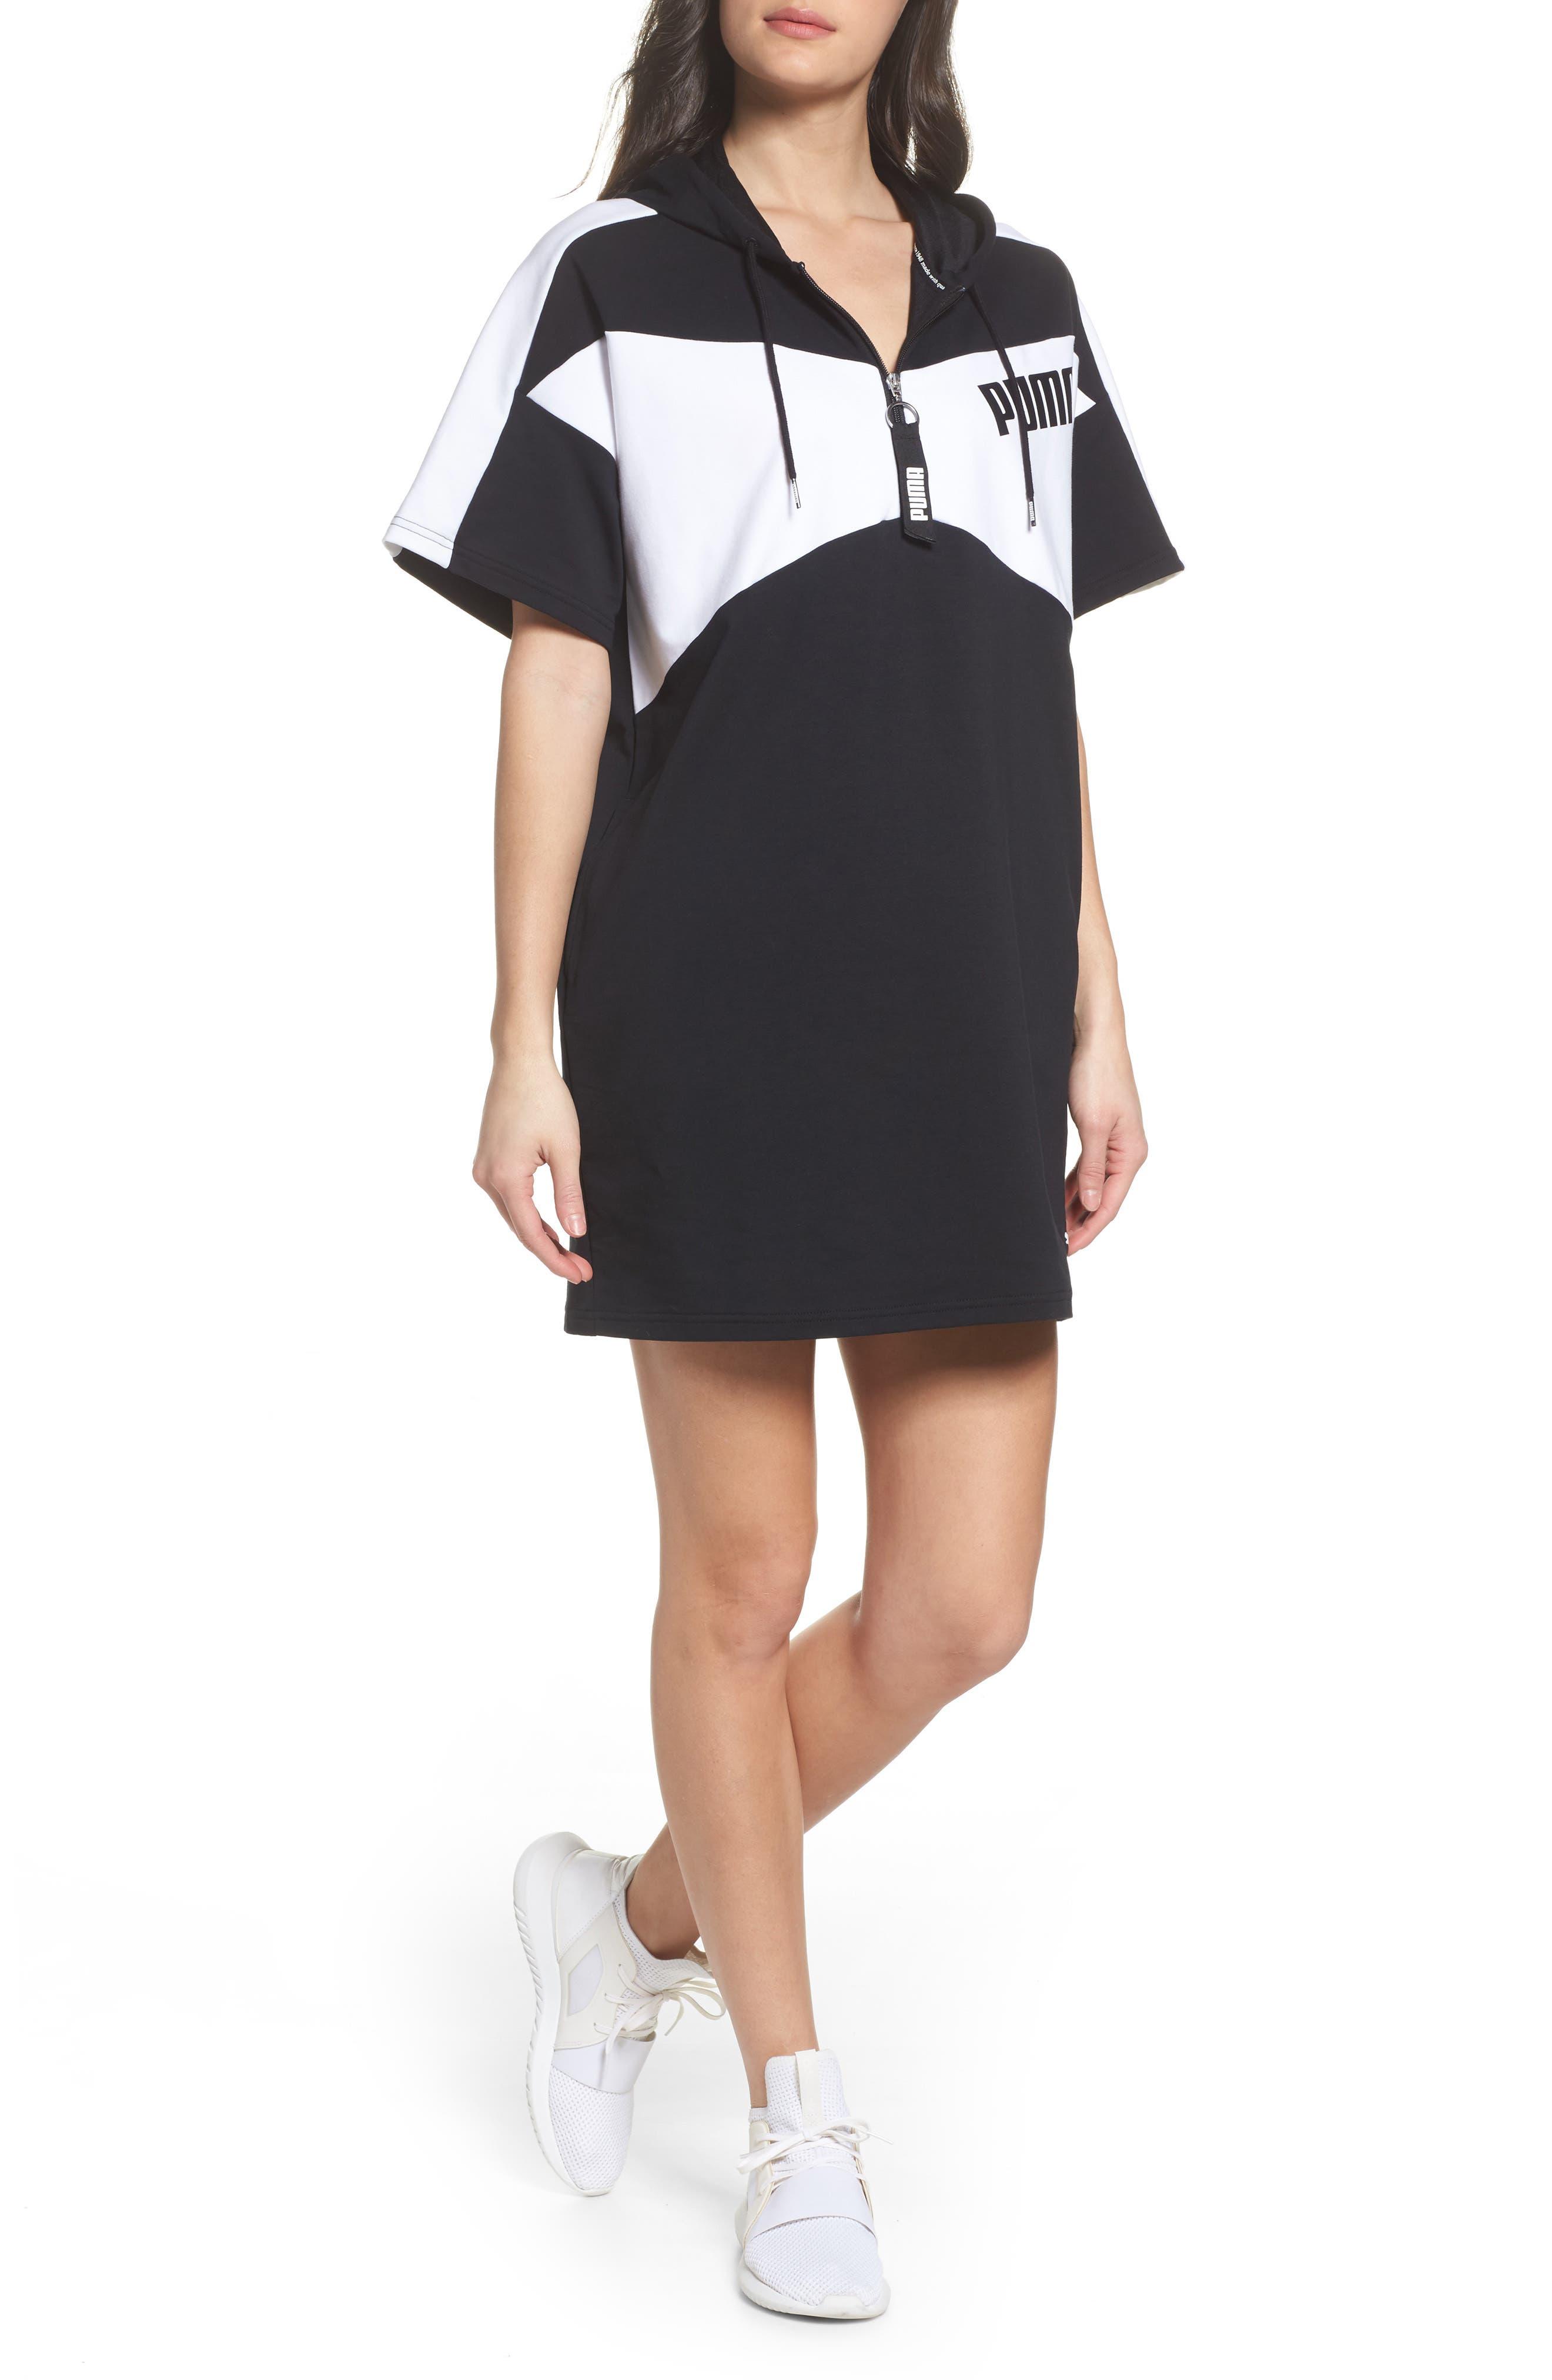 Archive Dress,                             Main thumbnail 1, color,                             Puma Black